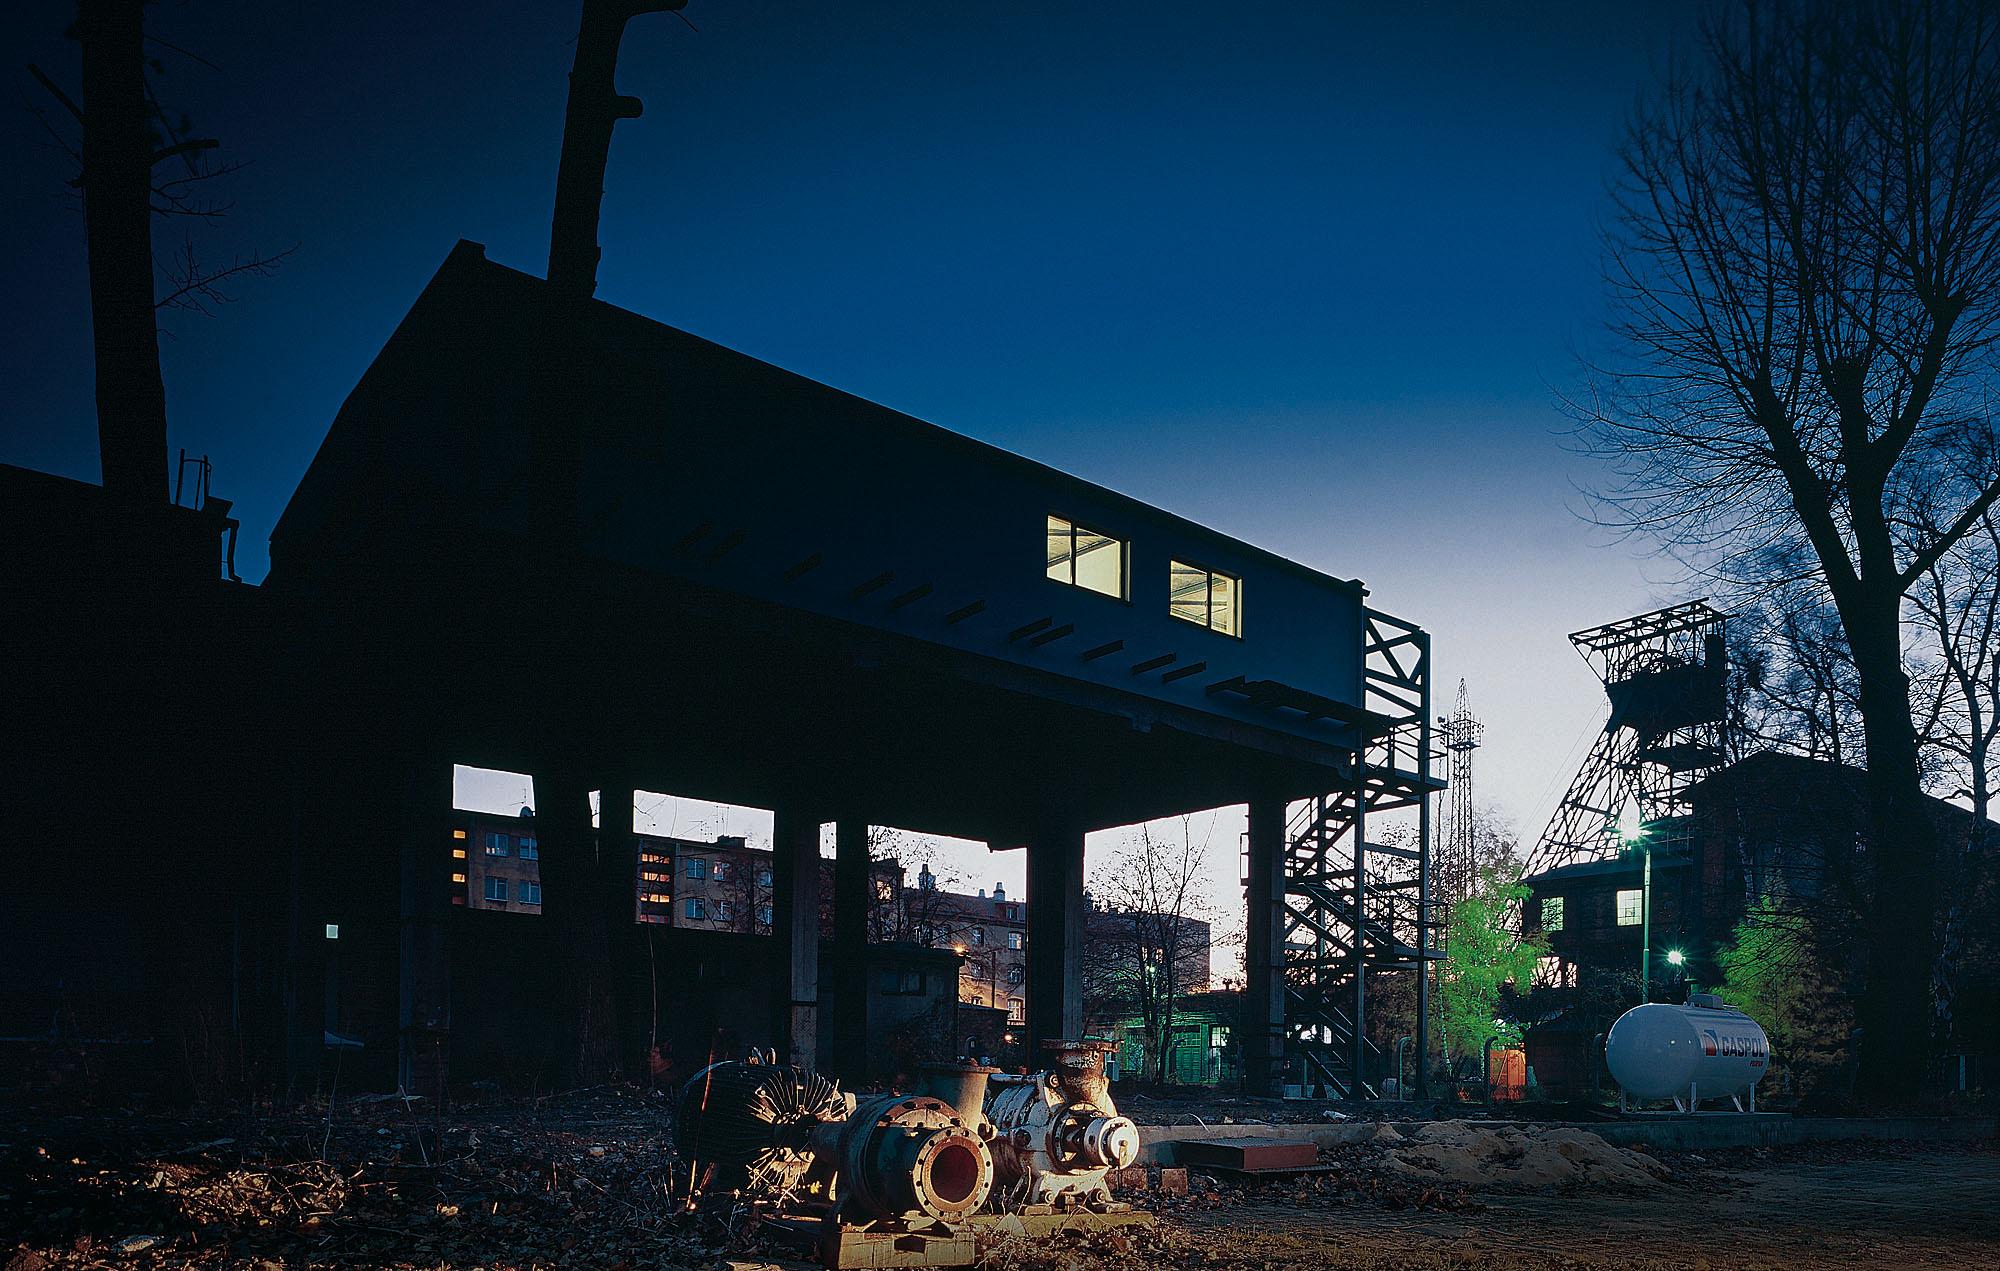 Пшемо Лукасик / Medusa Group. Bolko Loft (частный дом na территории шахты), 2002–2003, ул. Крушцова, Бытом, фото: Юлиуш Соколовский